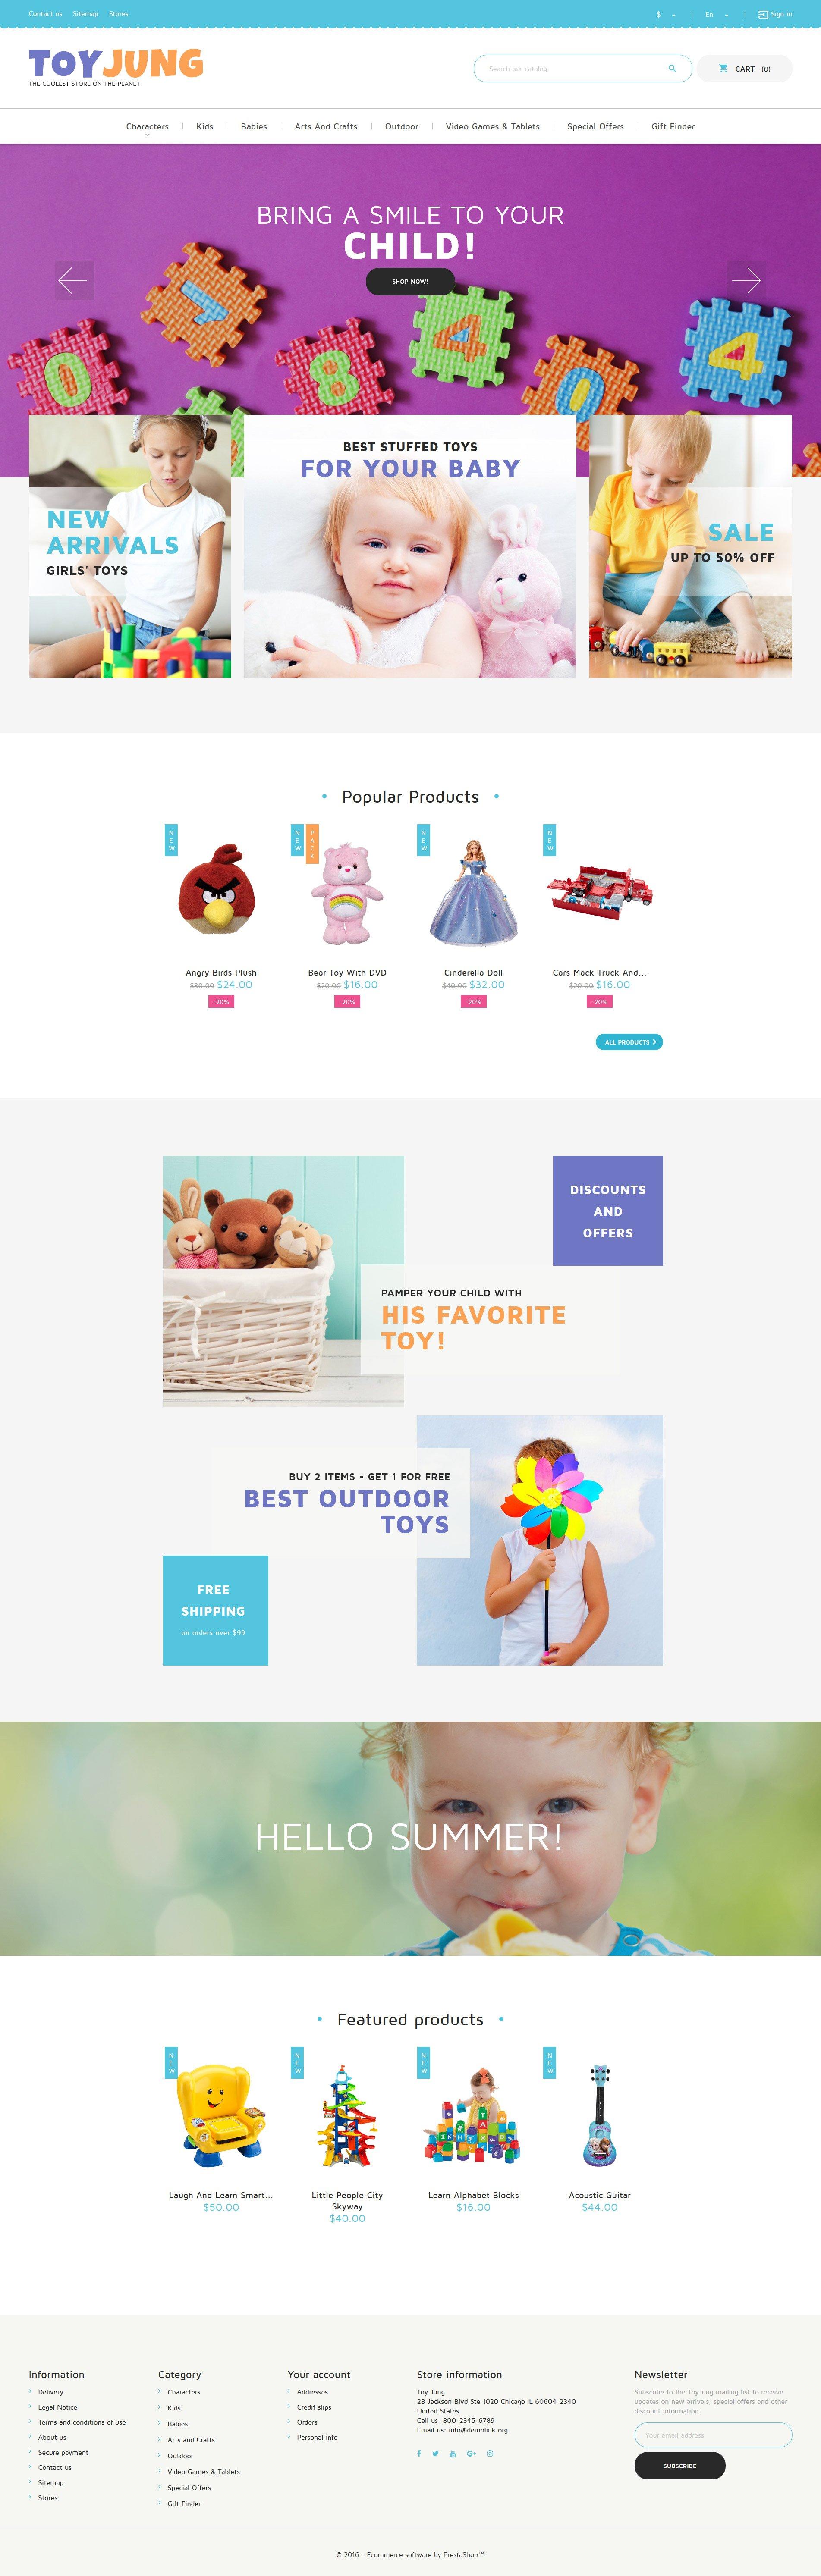 ToyJung - Toy Store Responsive PrestaShop Theme